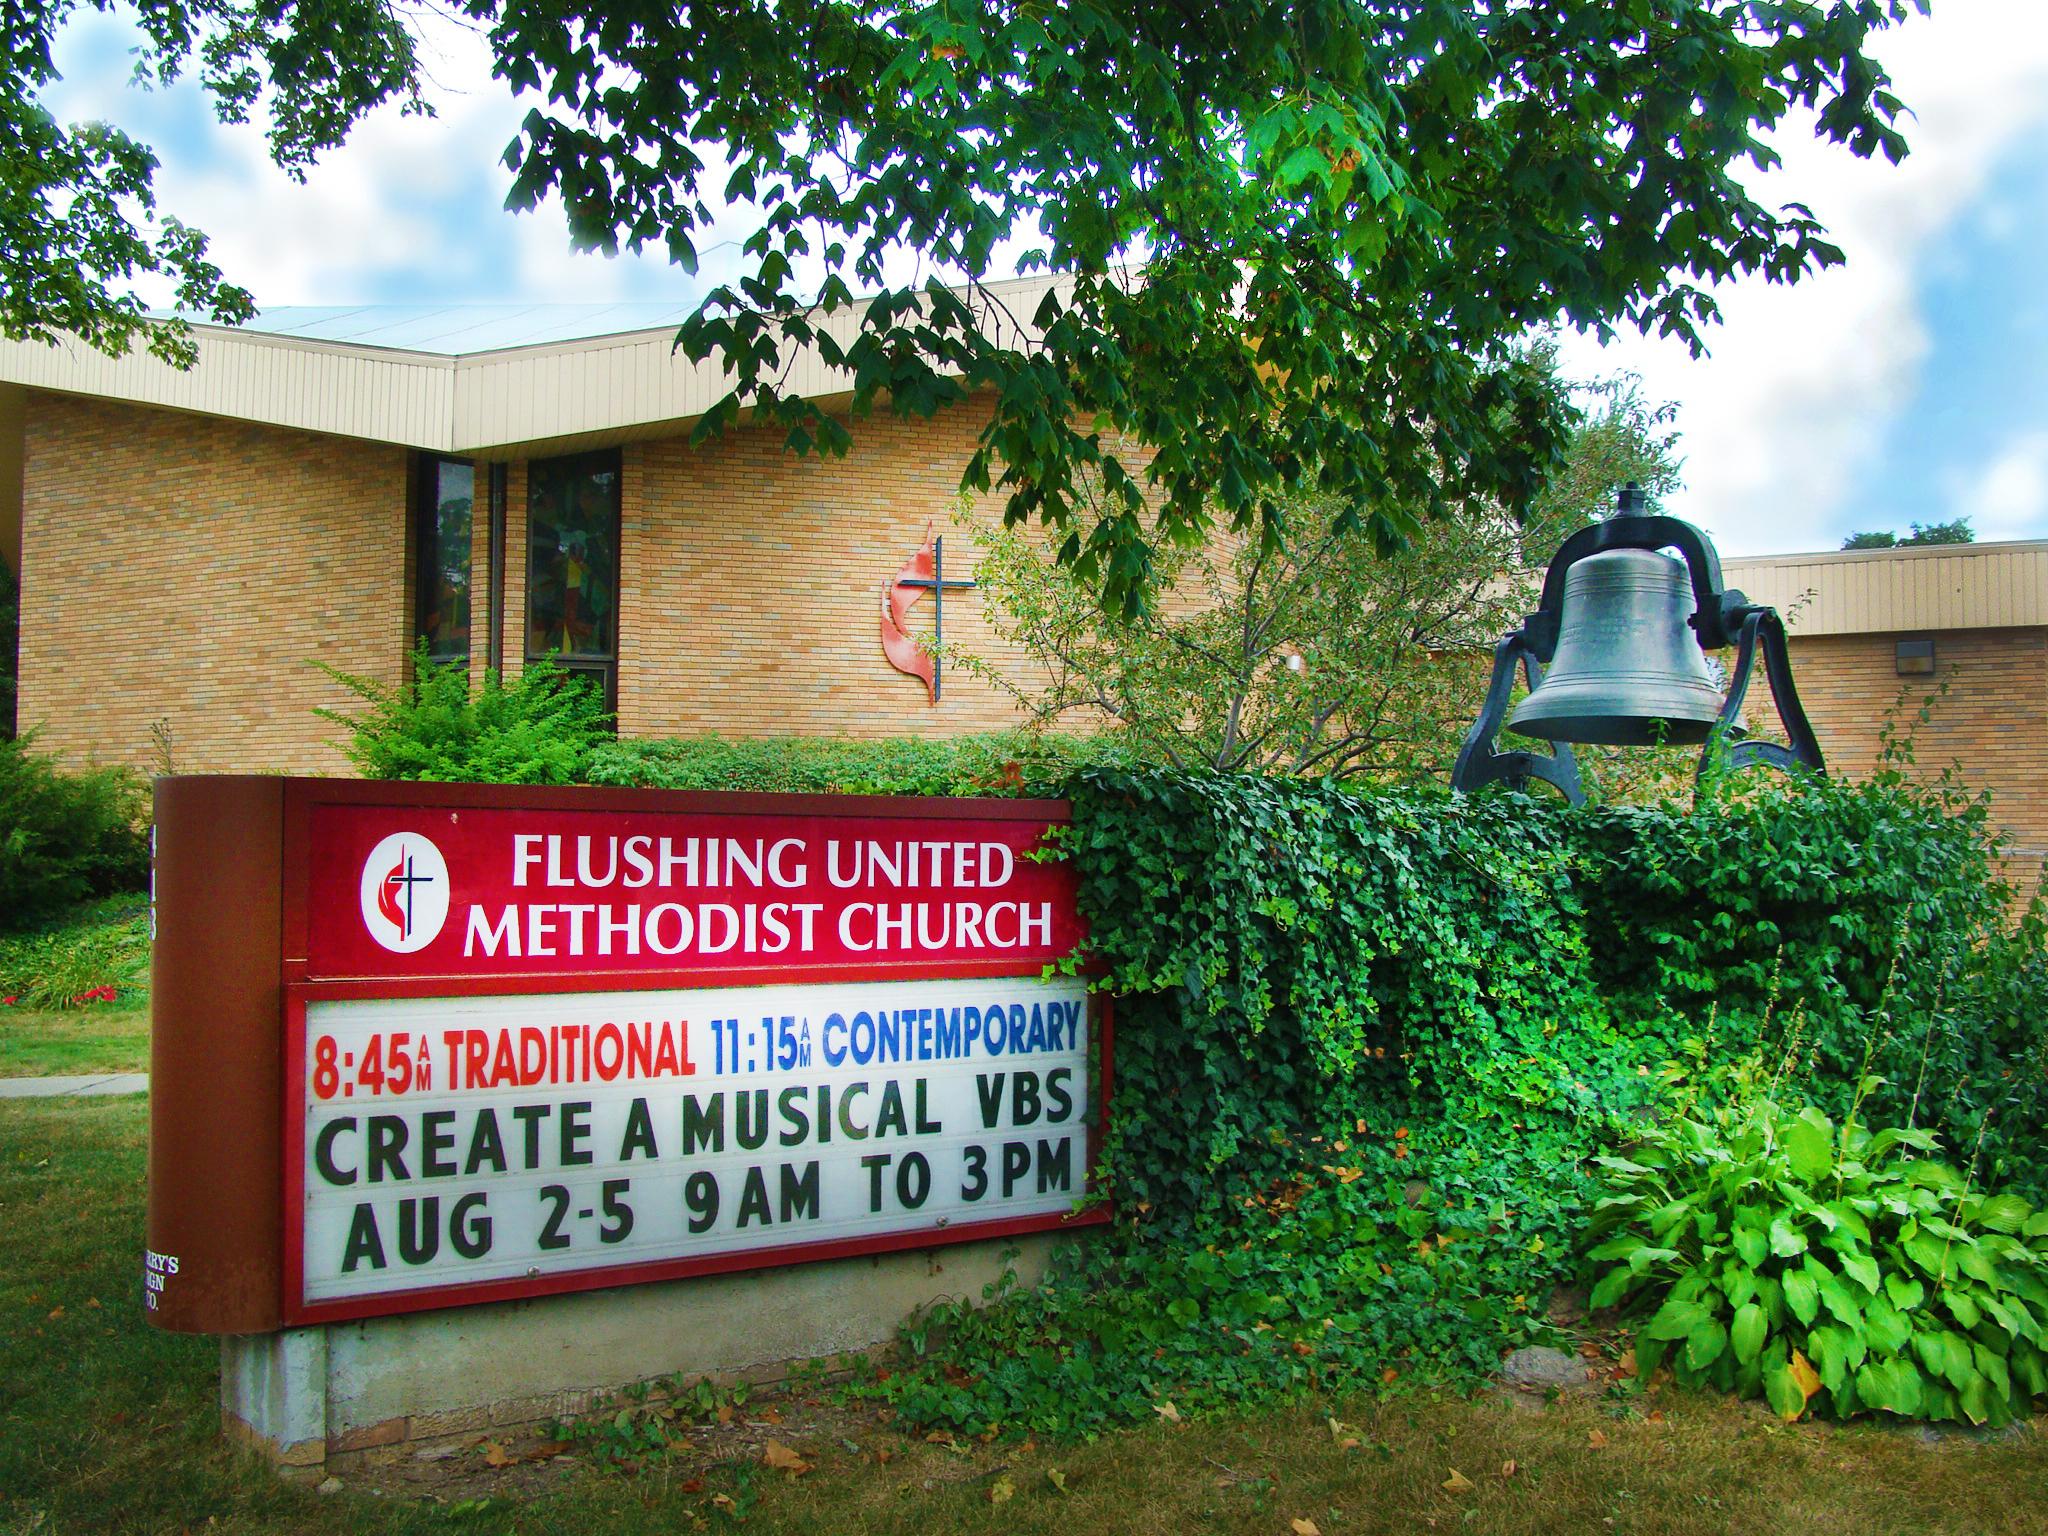 Flushing United Methodist Church